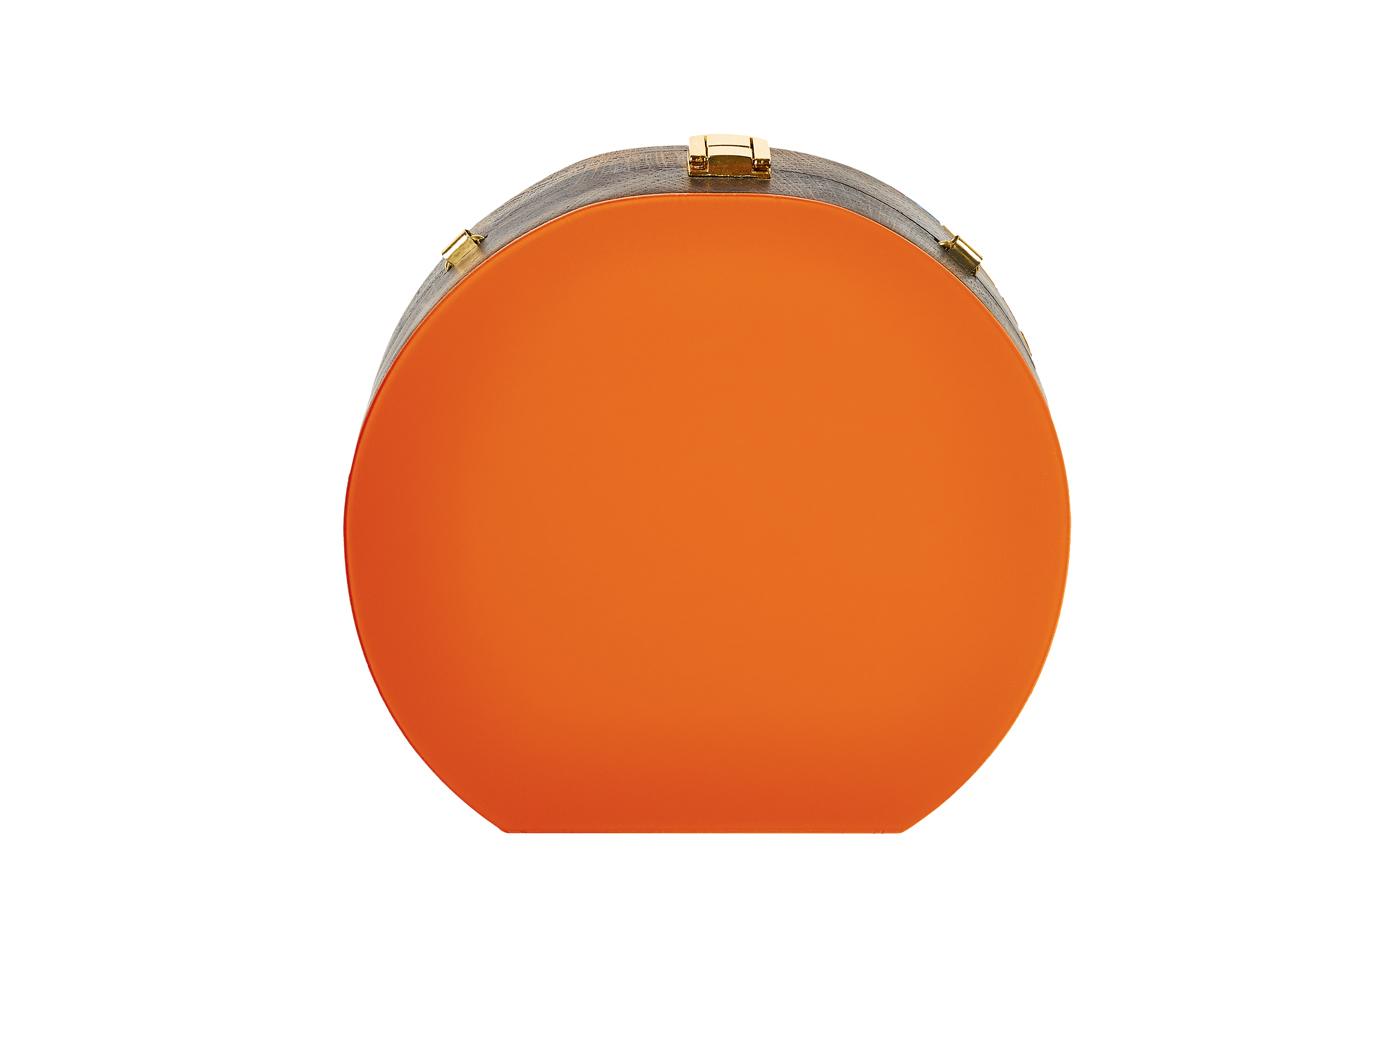 Golovina-marble-clutch-bag-orange-and-blue-2